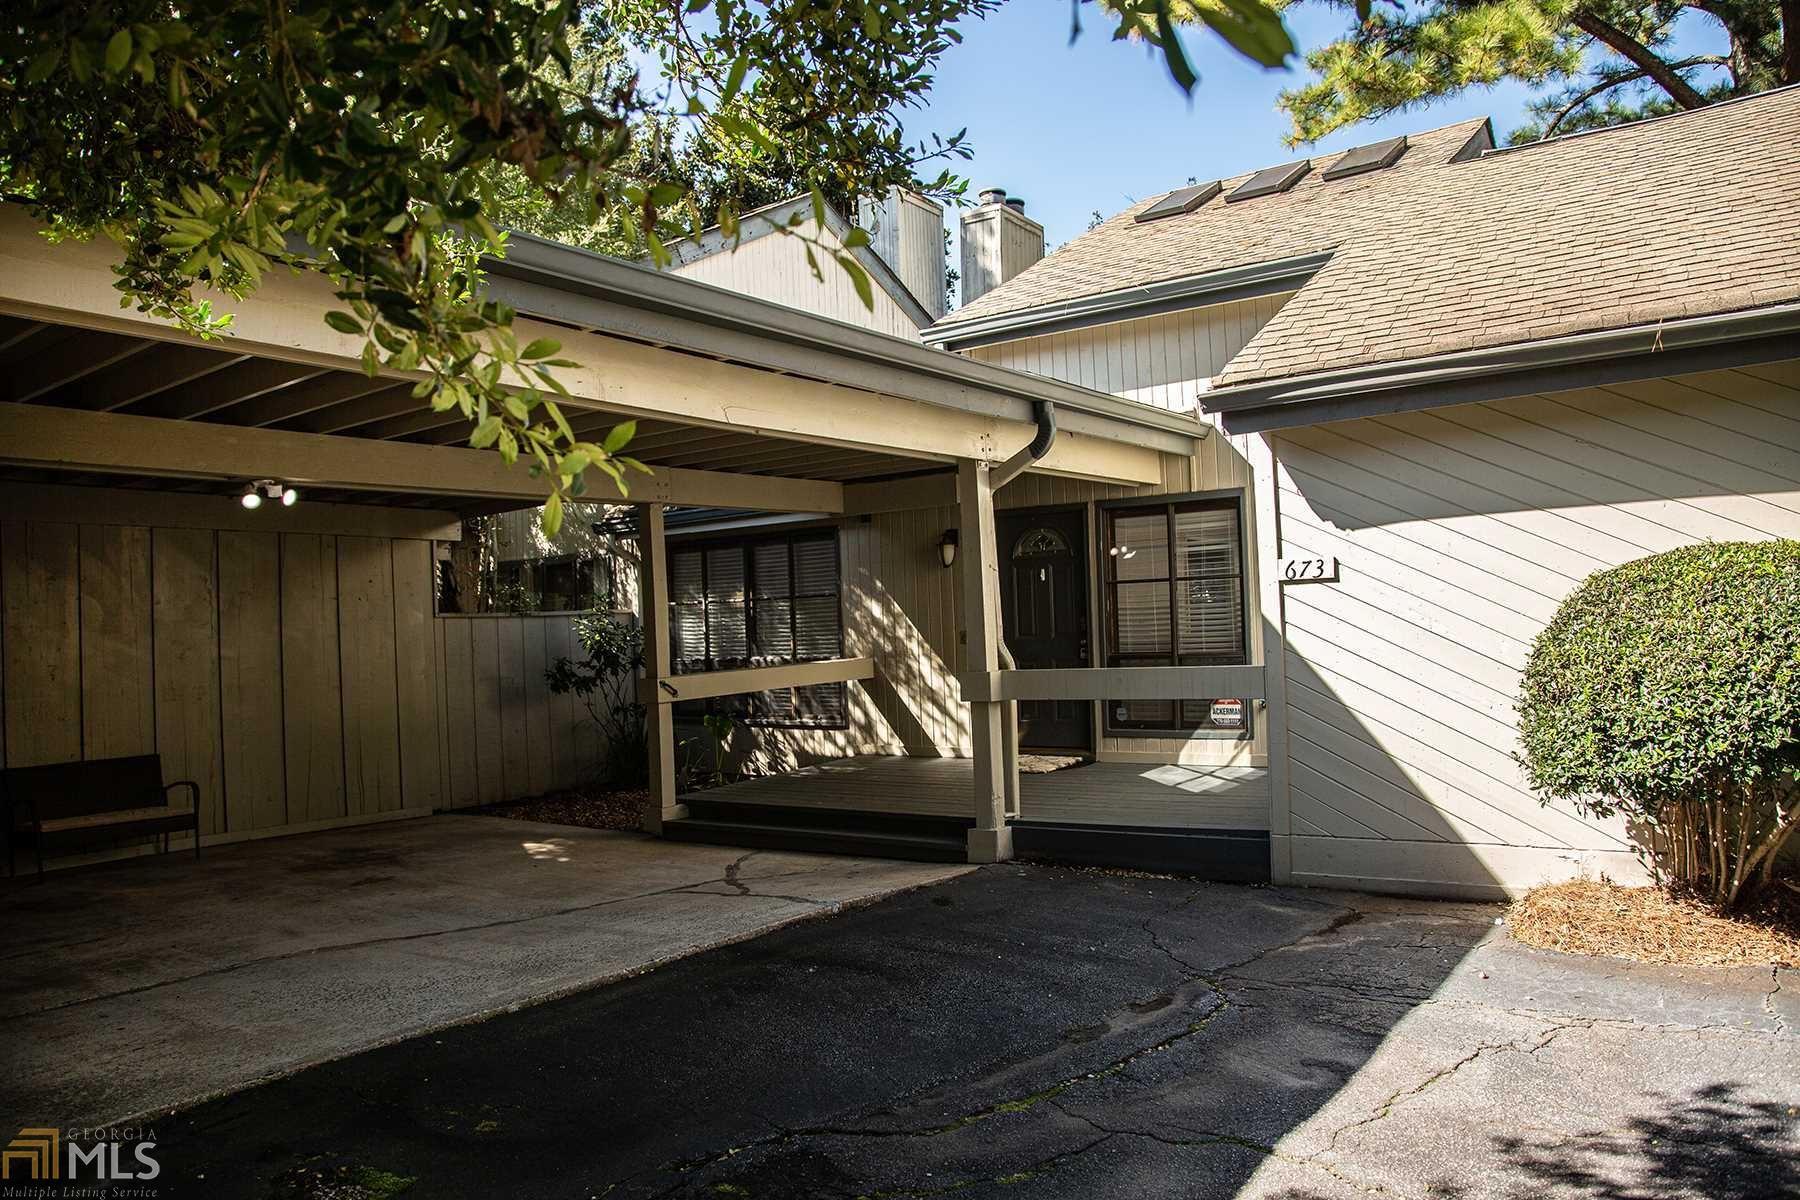 673 Highland Ct, Marietta, GA 30068 - MLS#: 8874450